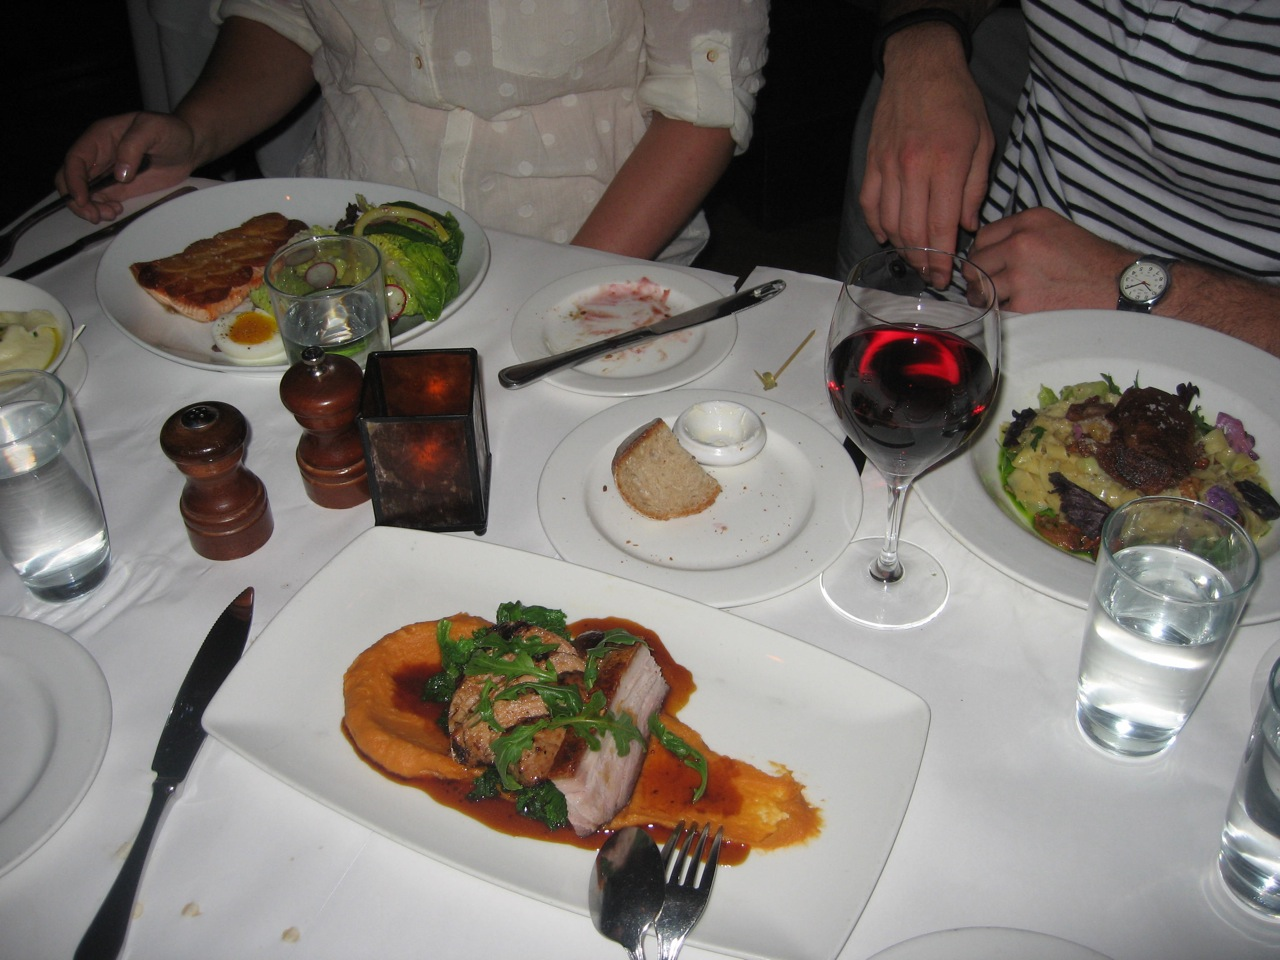 Dinner at Absinthe